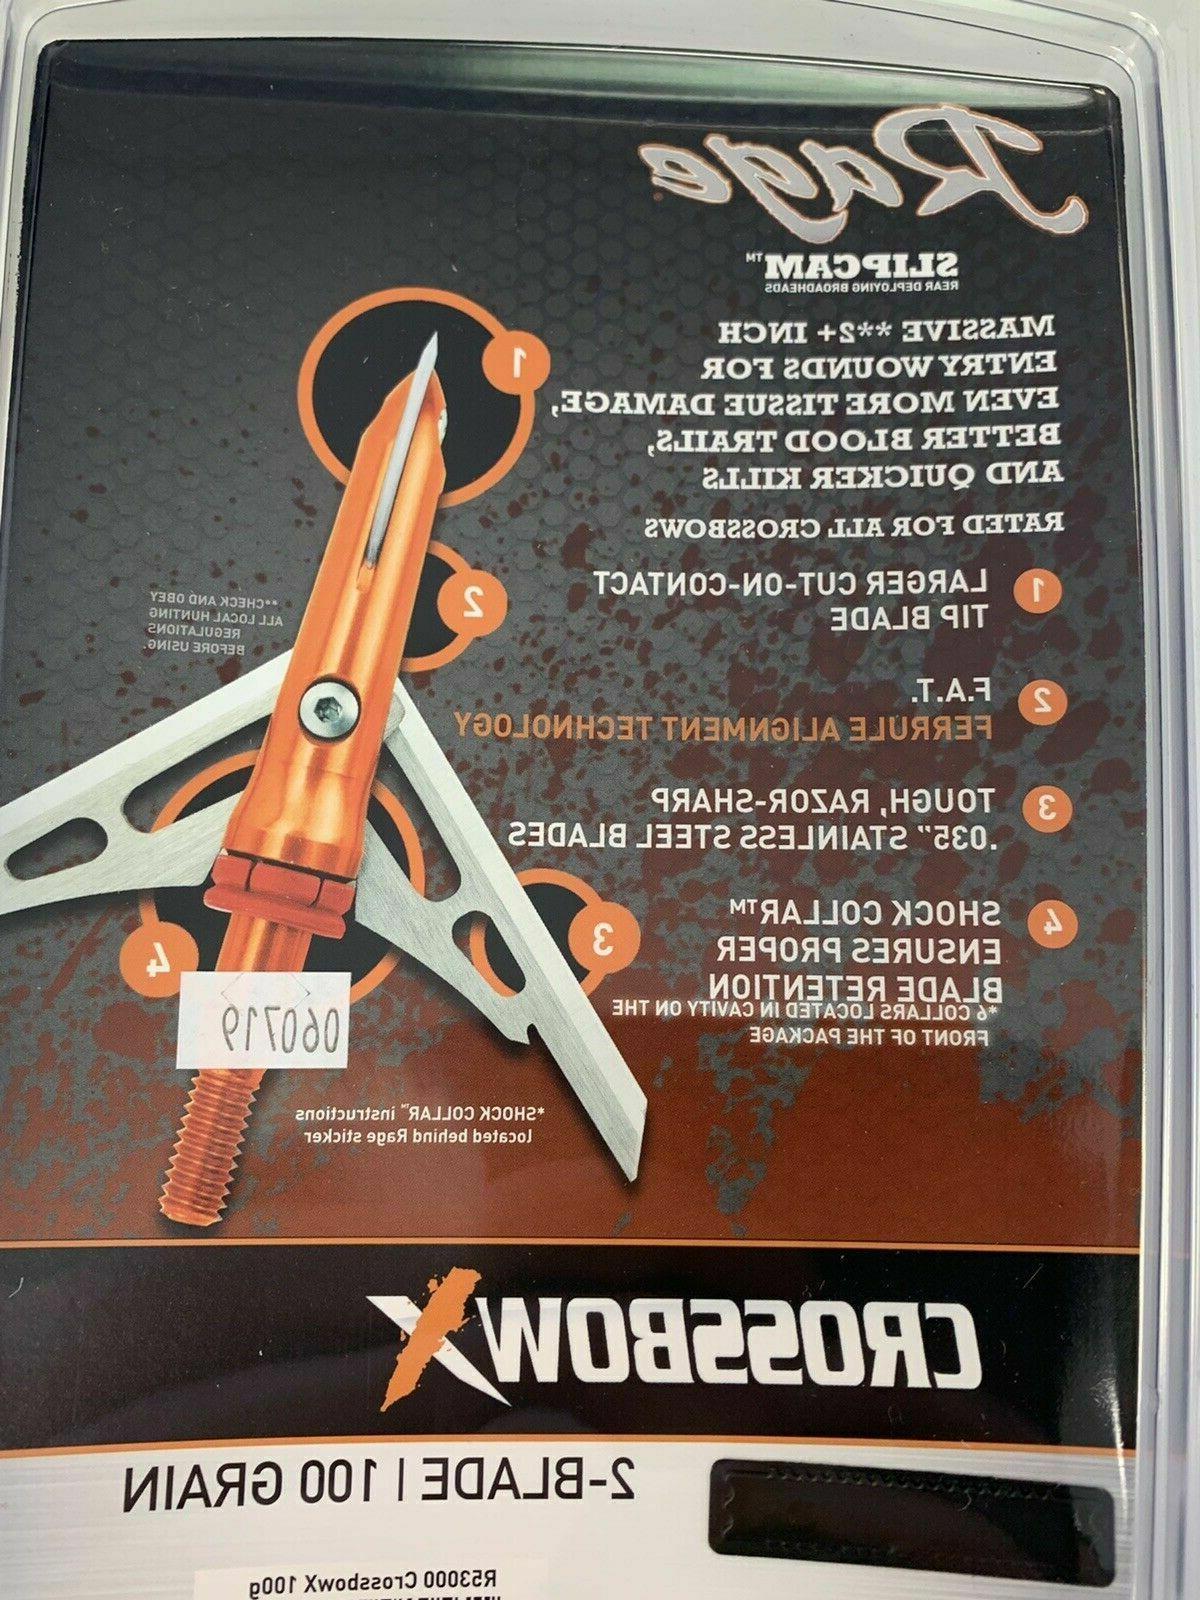 "NEW SlipCam Crossbow X 2"" Grain"